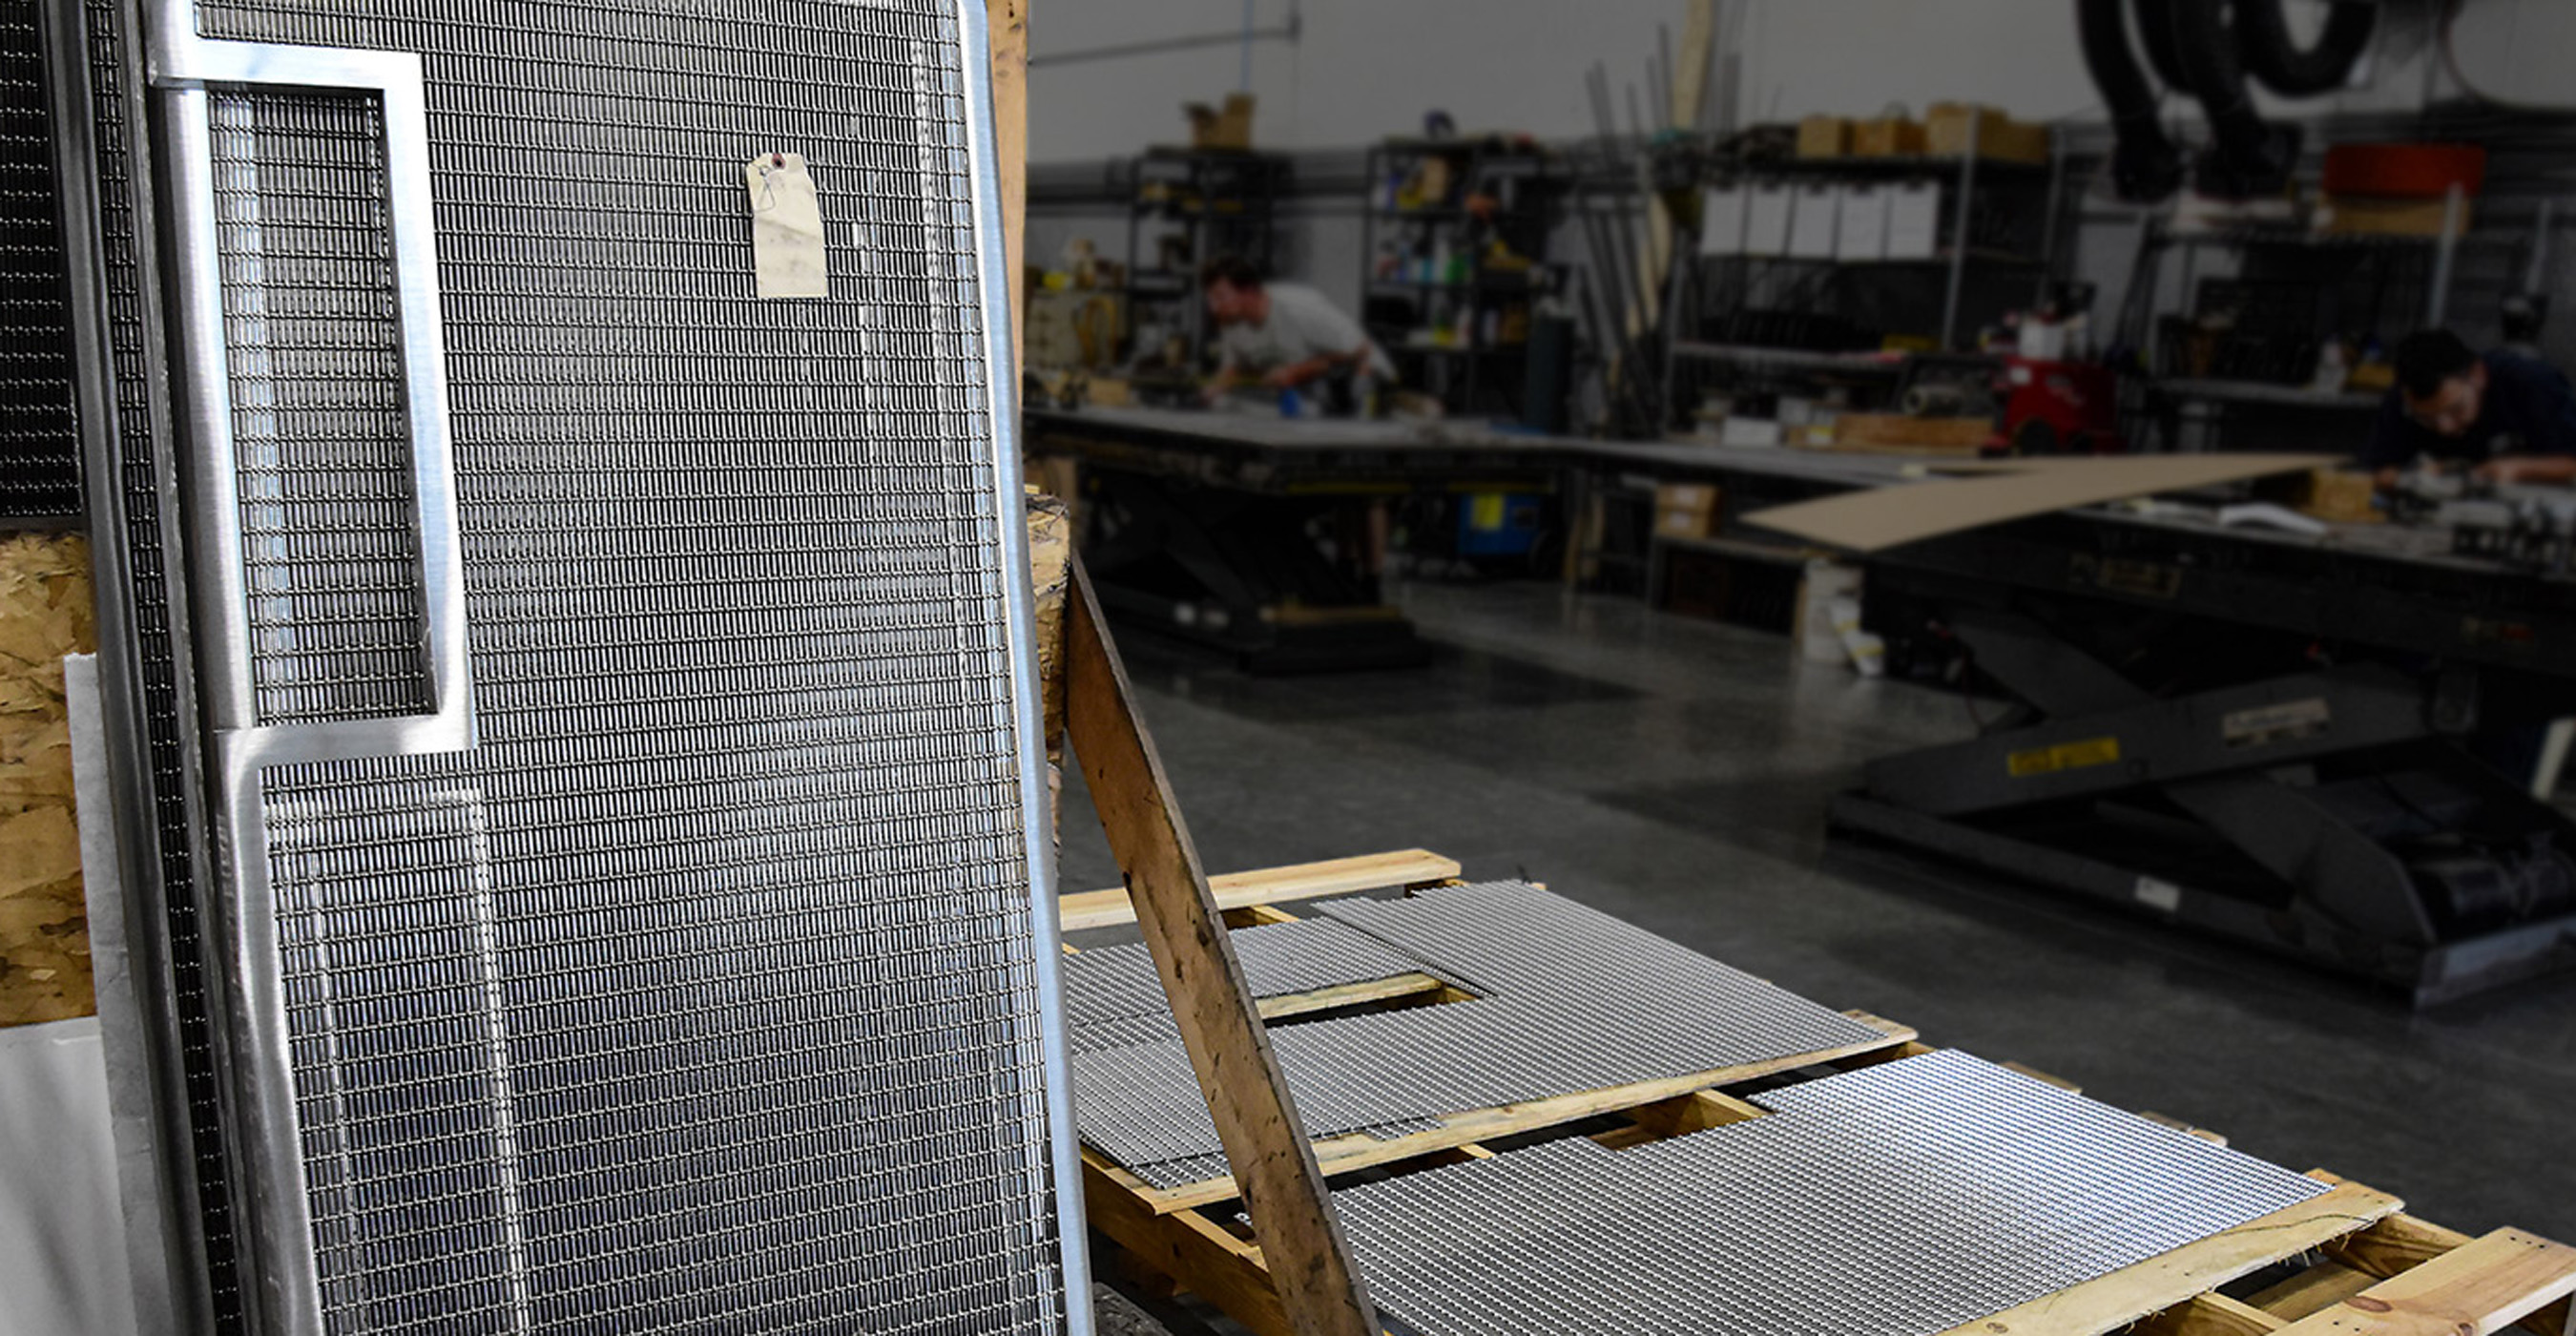 Banker Wire U-edge frames in fabrication